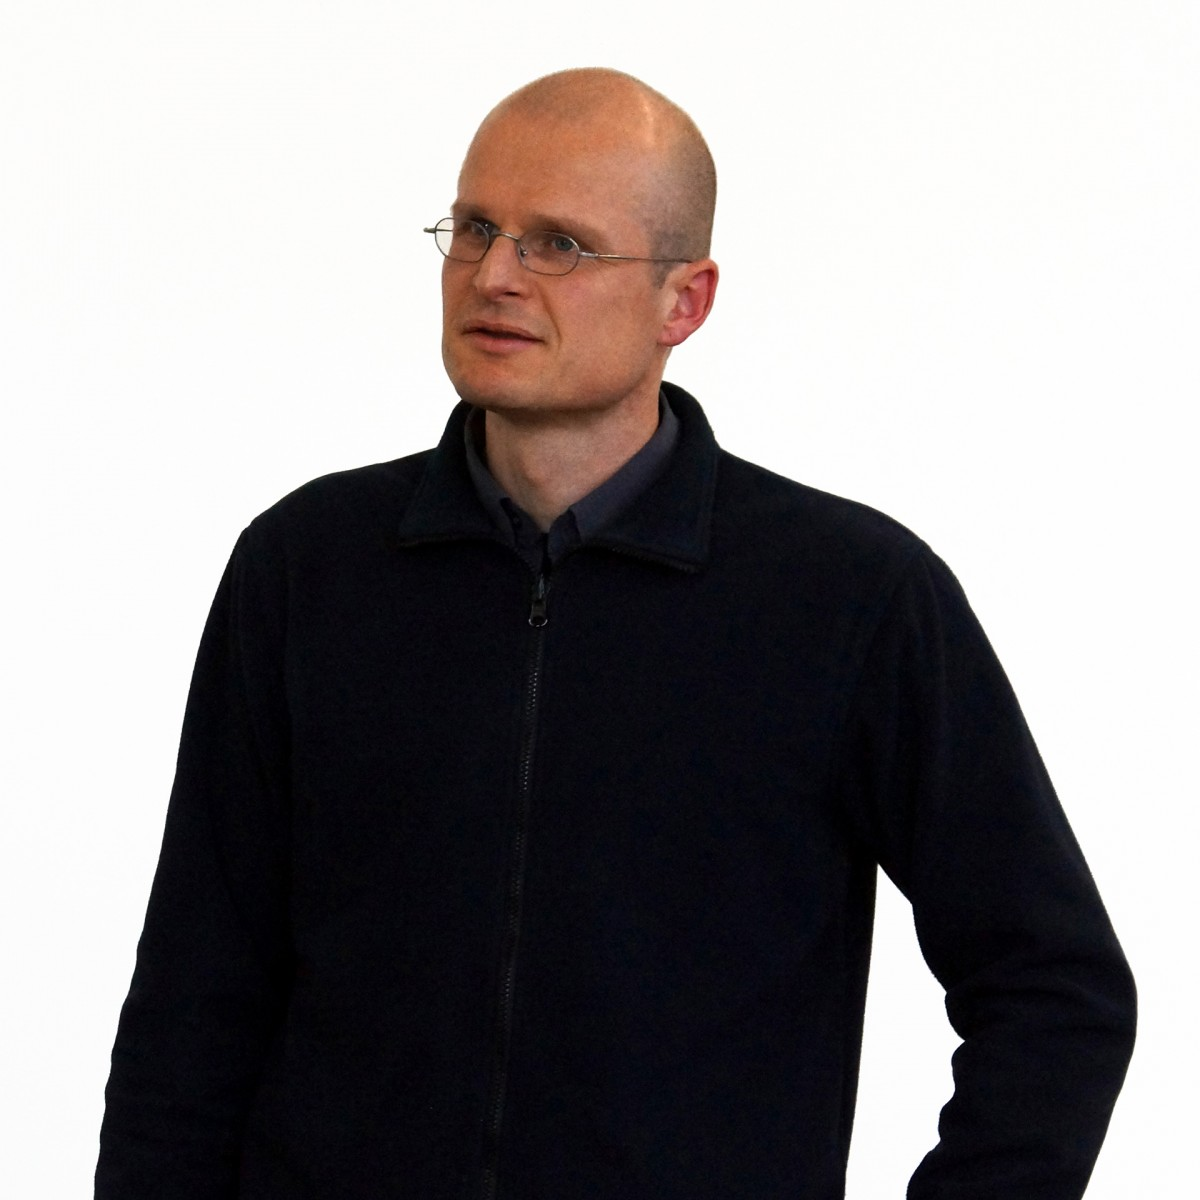 Jürgen Krause (Bild 12): Künstler im Gespräch – Kunsthaus Nürnberg (2015)